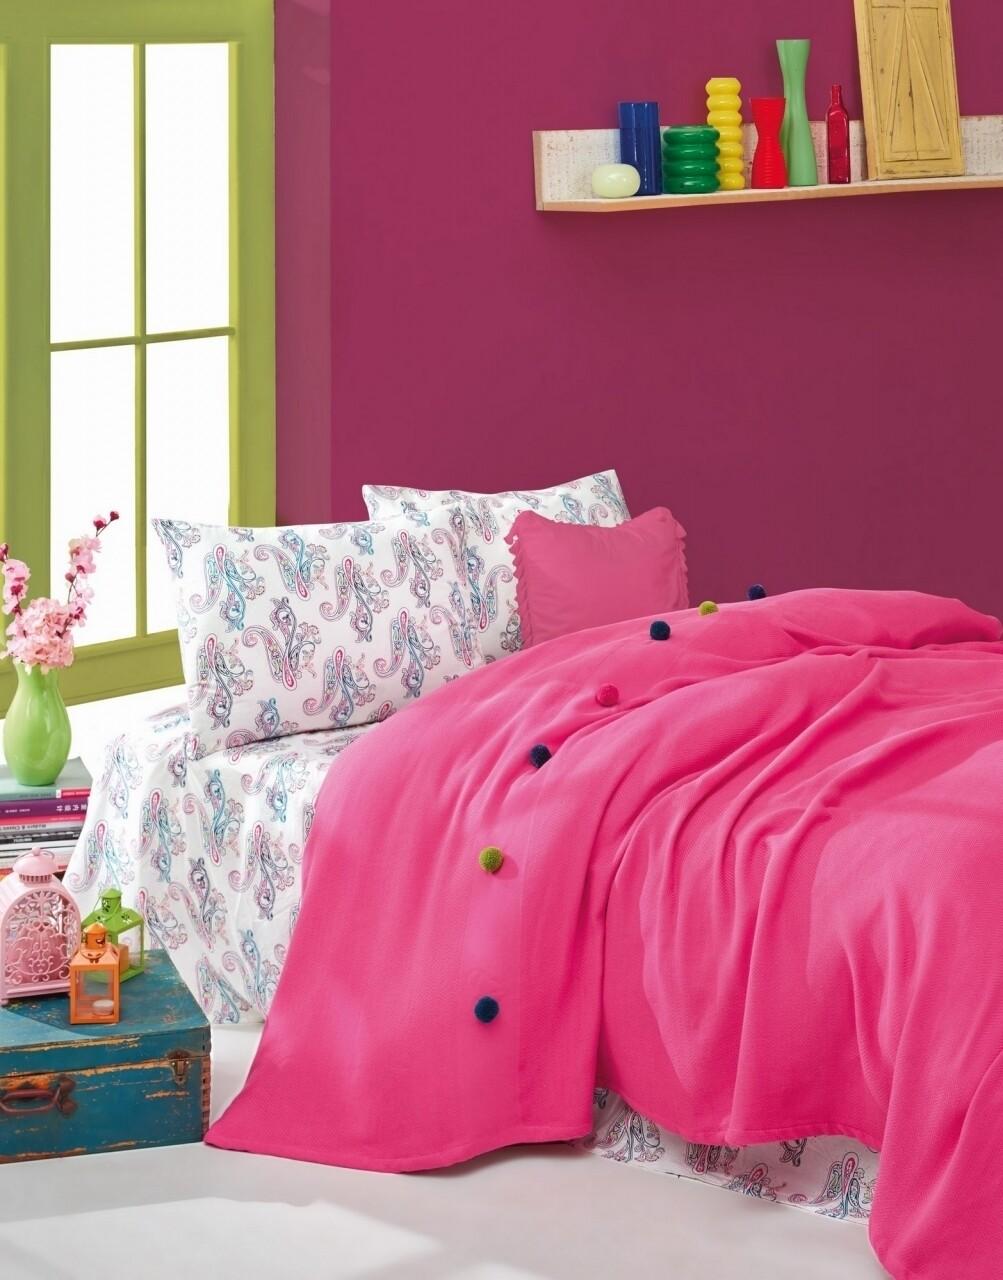 Set lenjerie de pat + cuvertura pentru o persoana Fancy Fuchsia, Cotton Box, 3 piese, 160 x 230 cm, 100% bumbac ranforce, roz